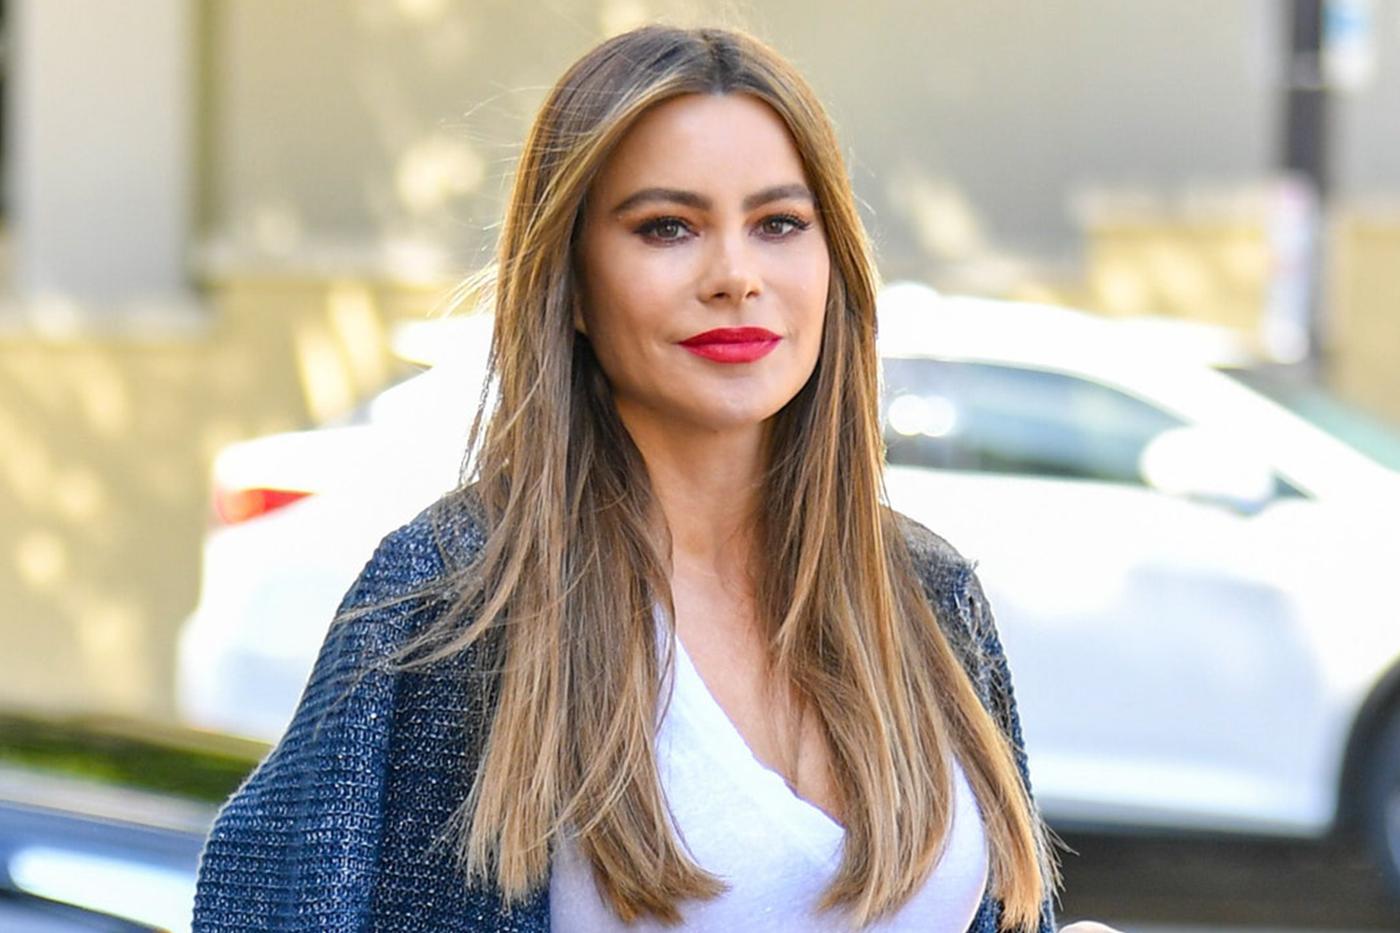 Sofia Vergara launches beauty brand